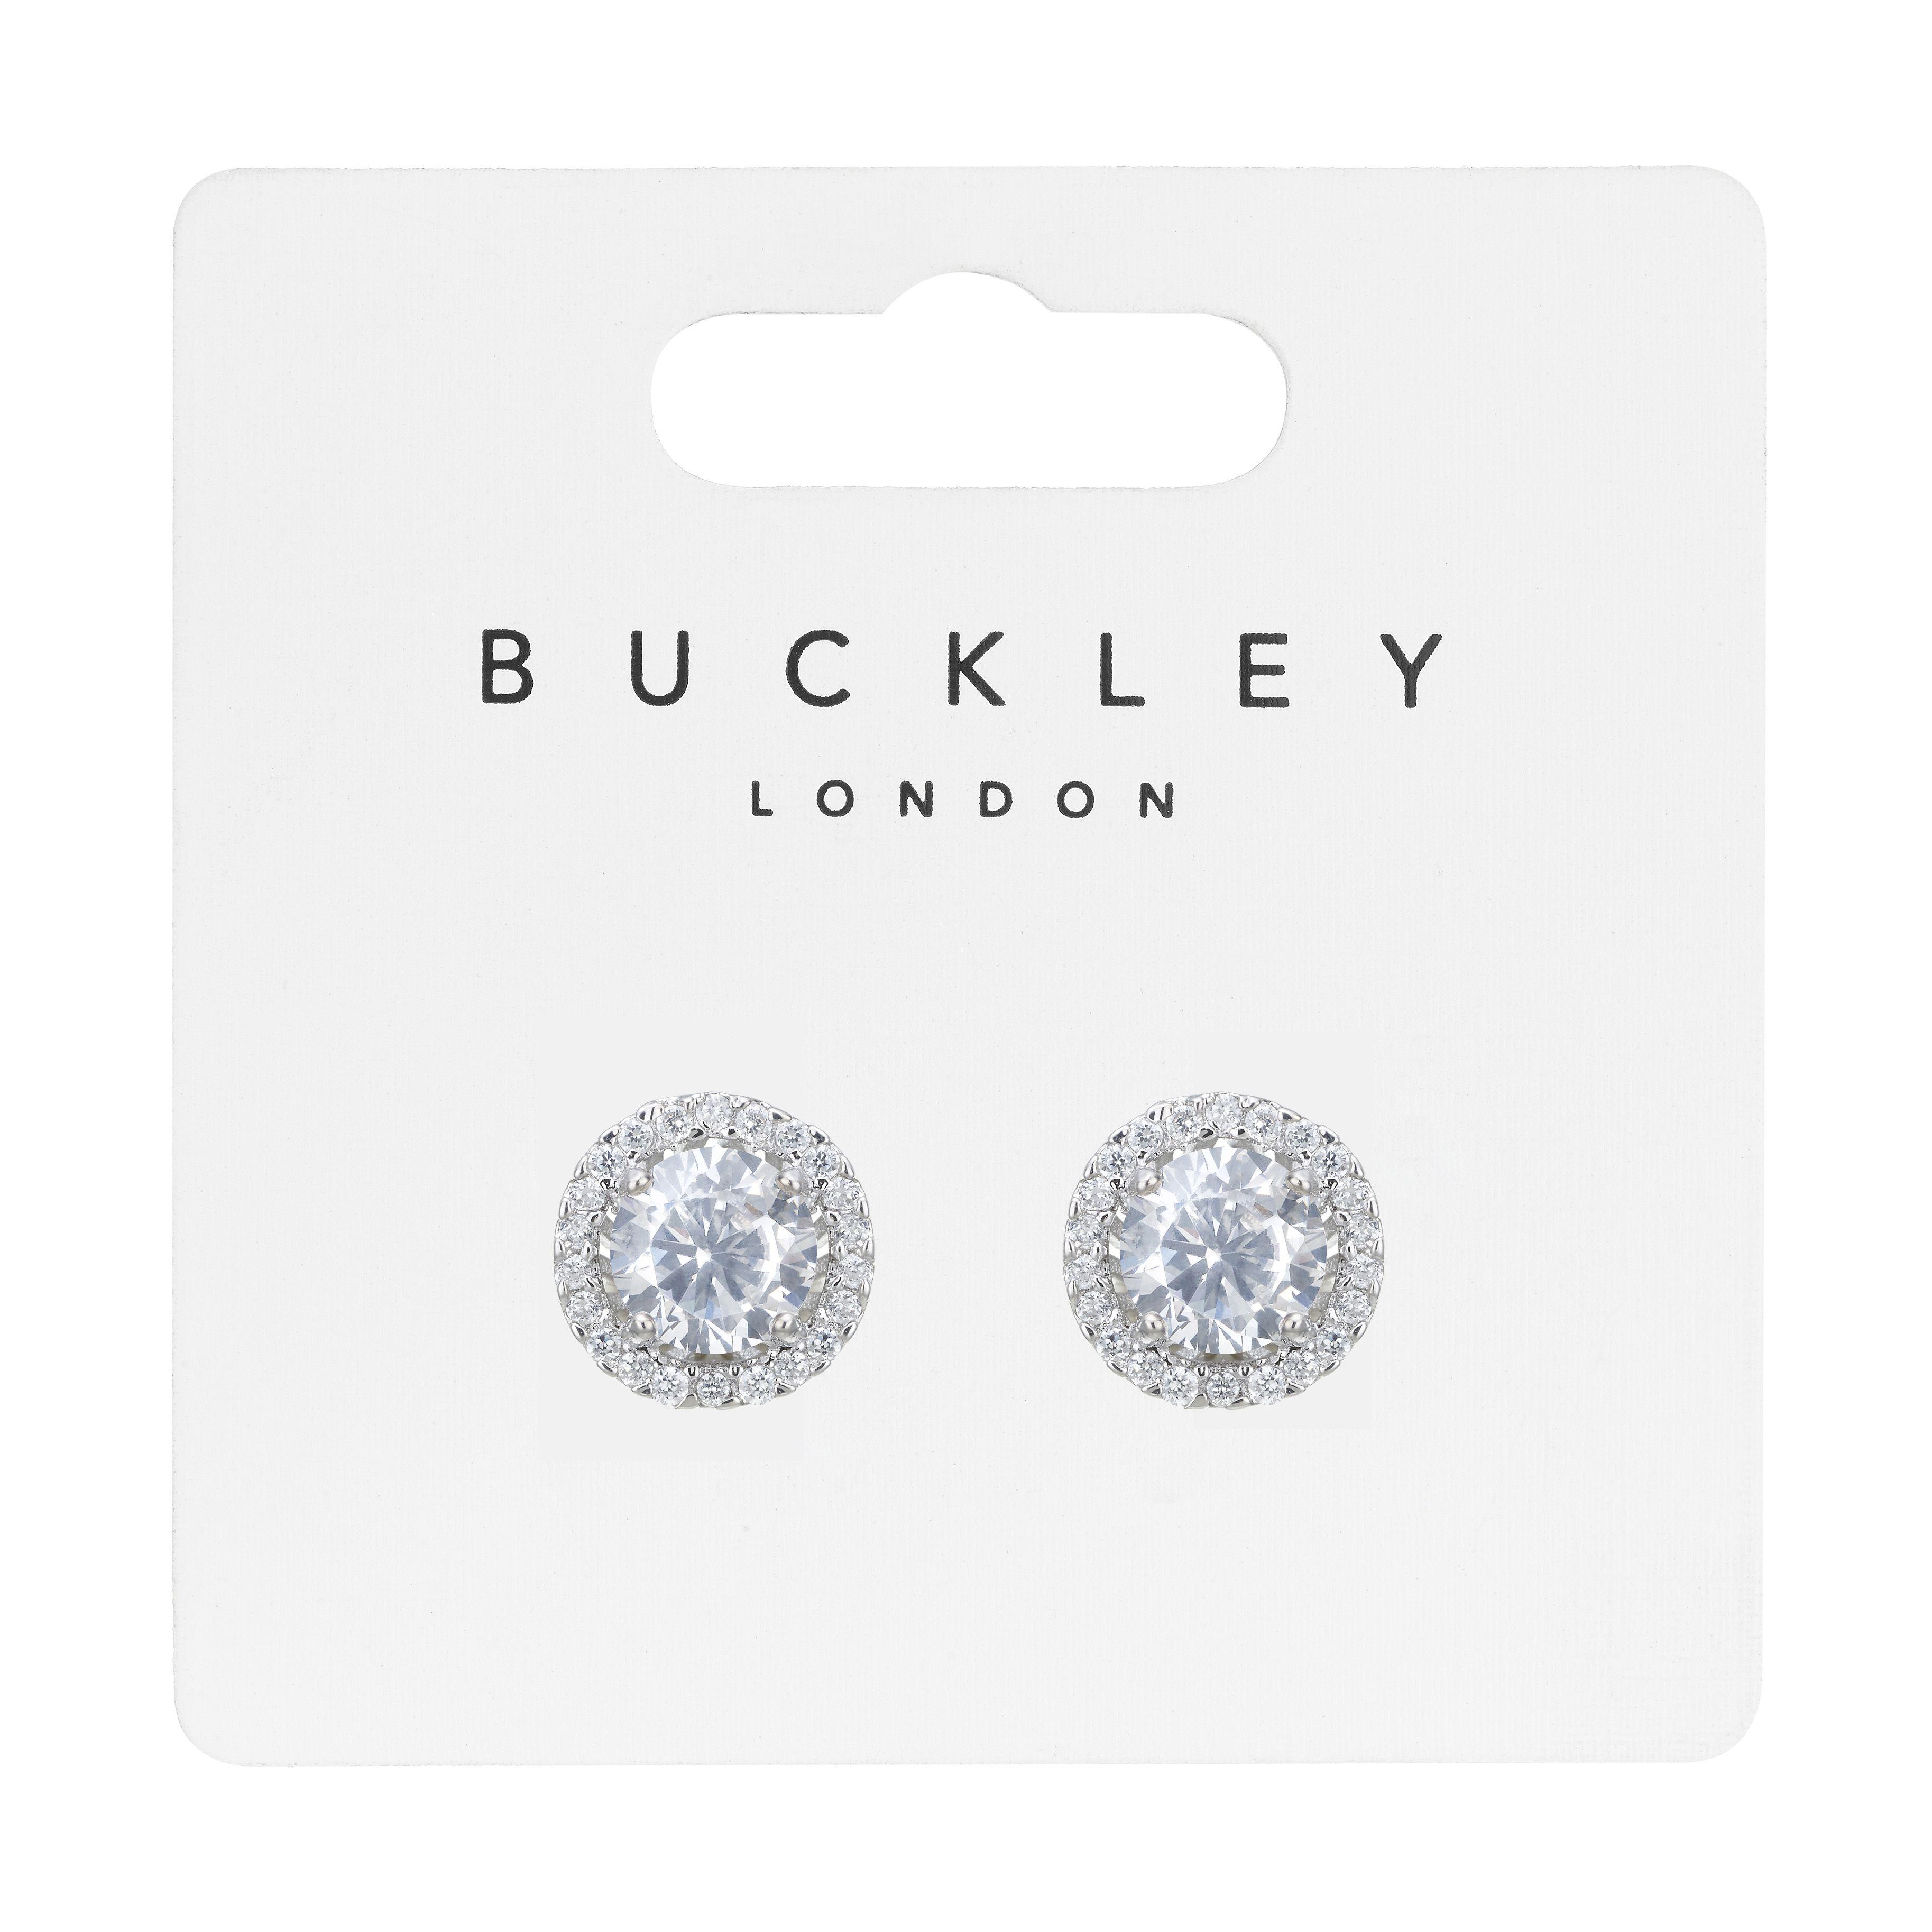 Buckley London Classic Brilliant-Cut Stud Earrings